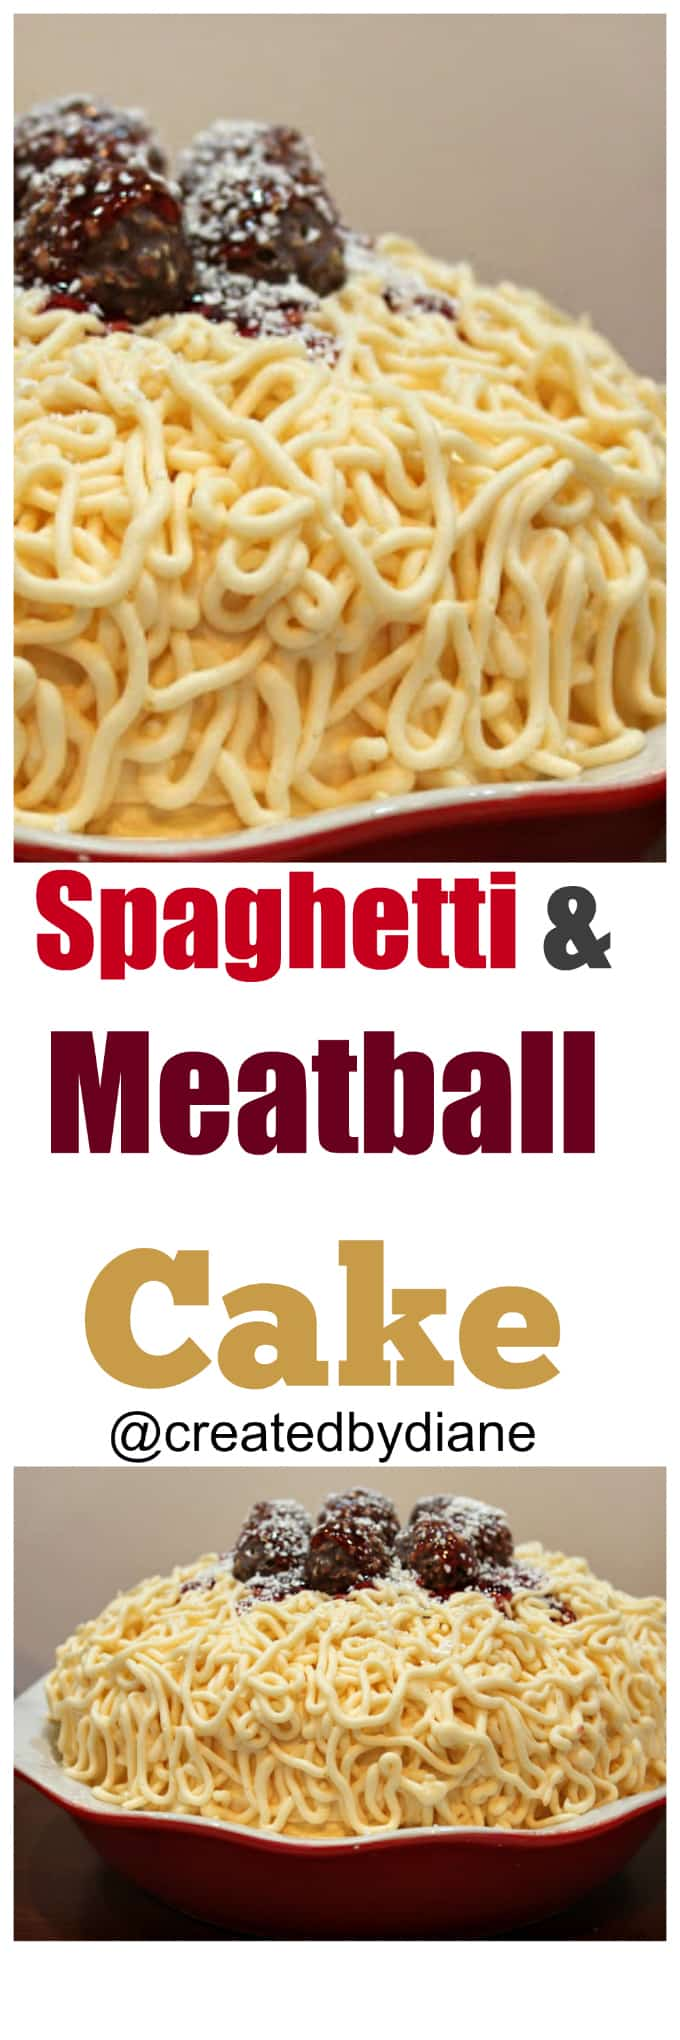 spaghetti and meatball cake @createdbydiane